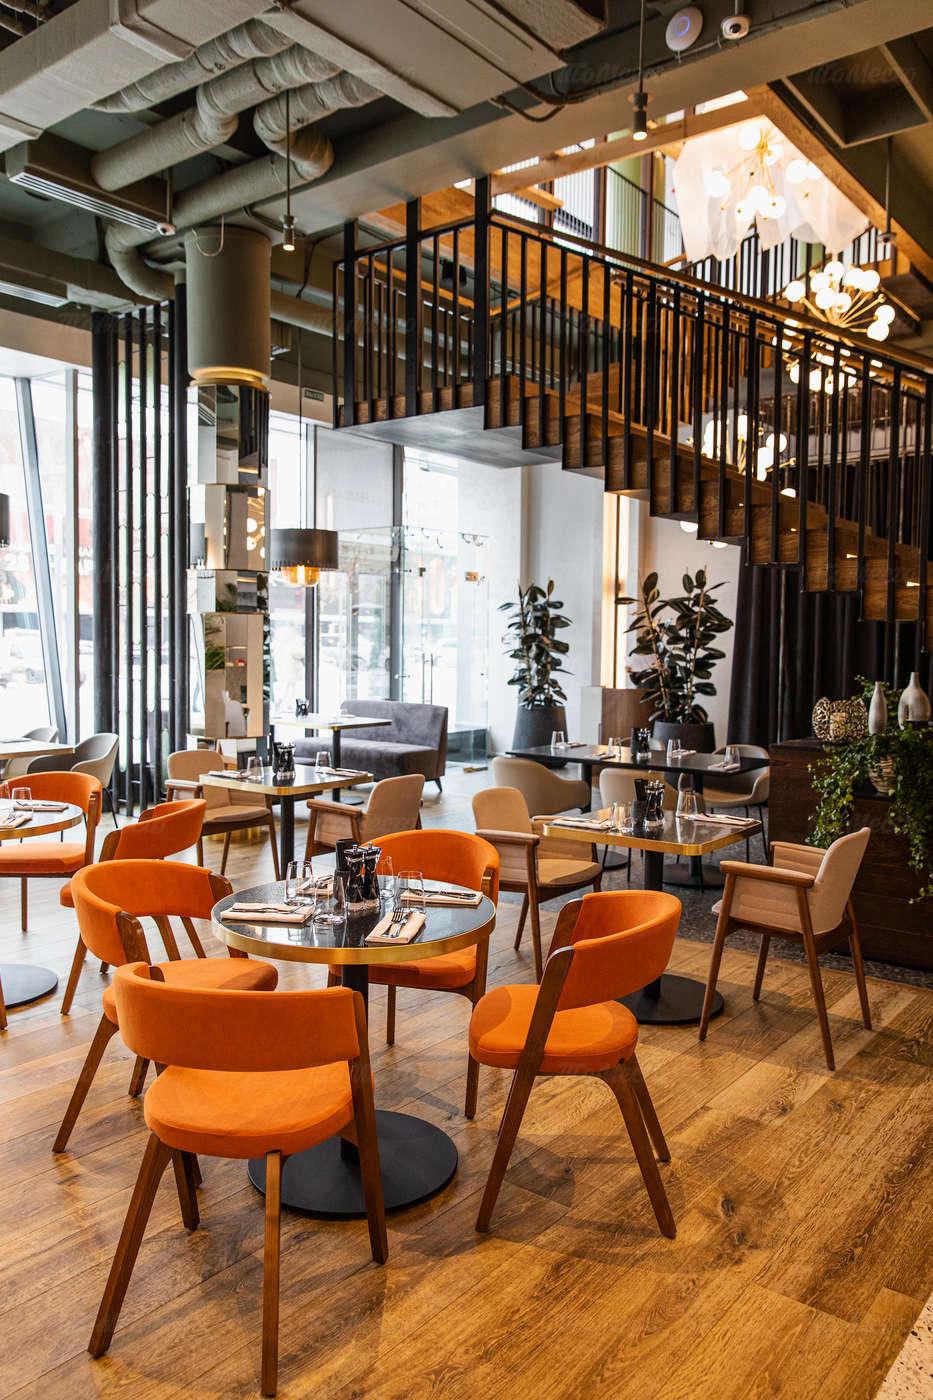 Ресторан Cafe Milano (Милано) на Новом Арбате фото 2